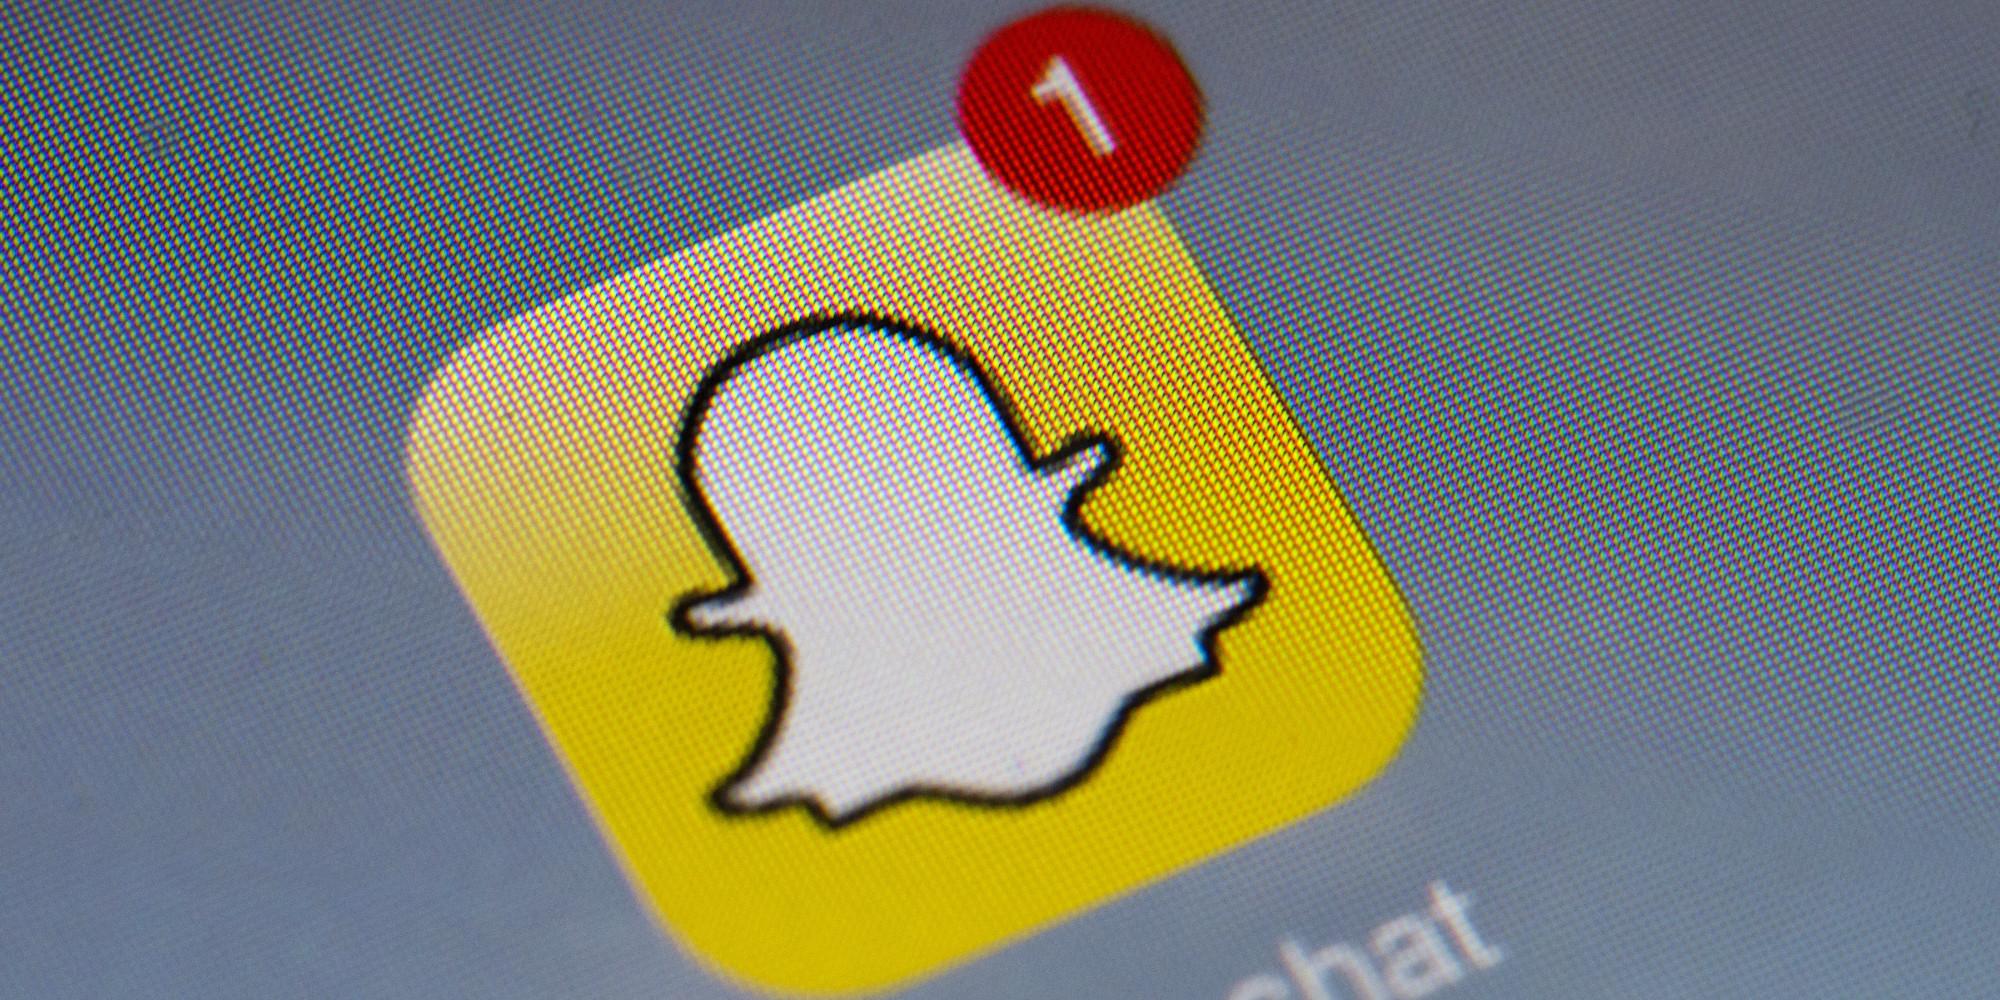 Snapchat Symbols O-snapchat-facebook.jpg